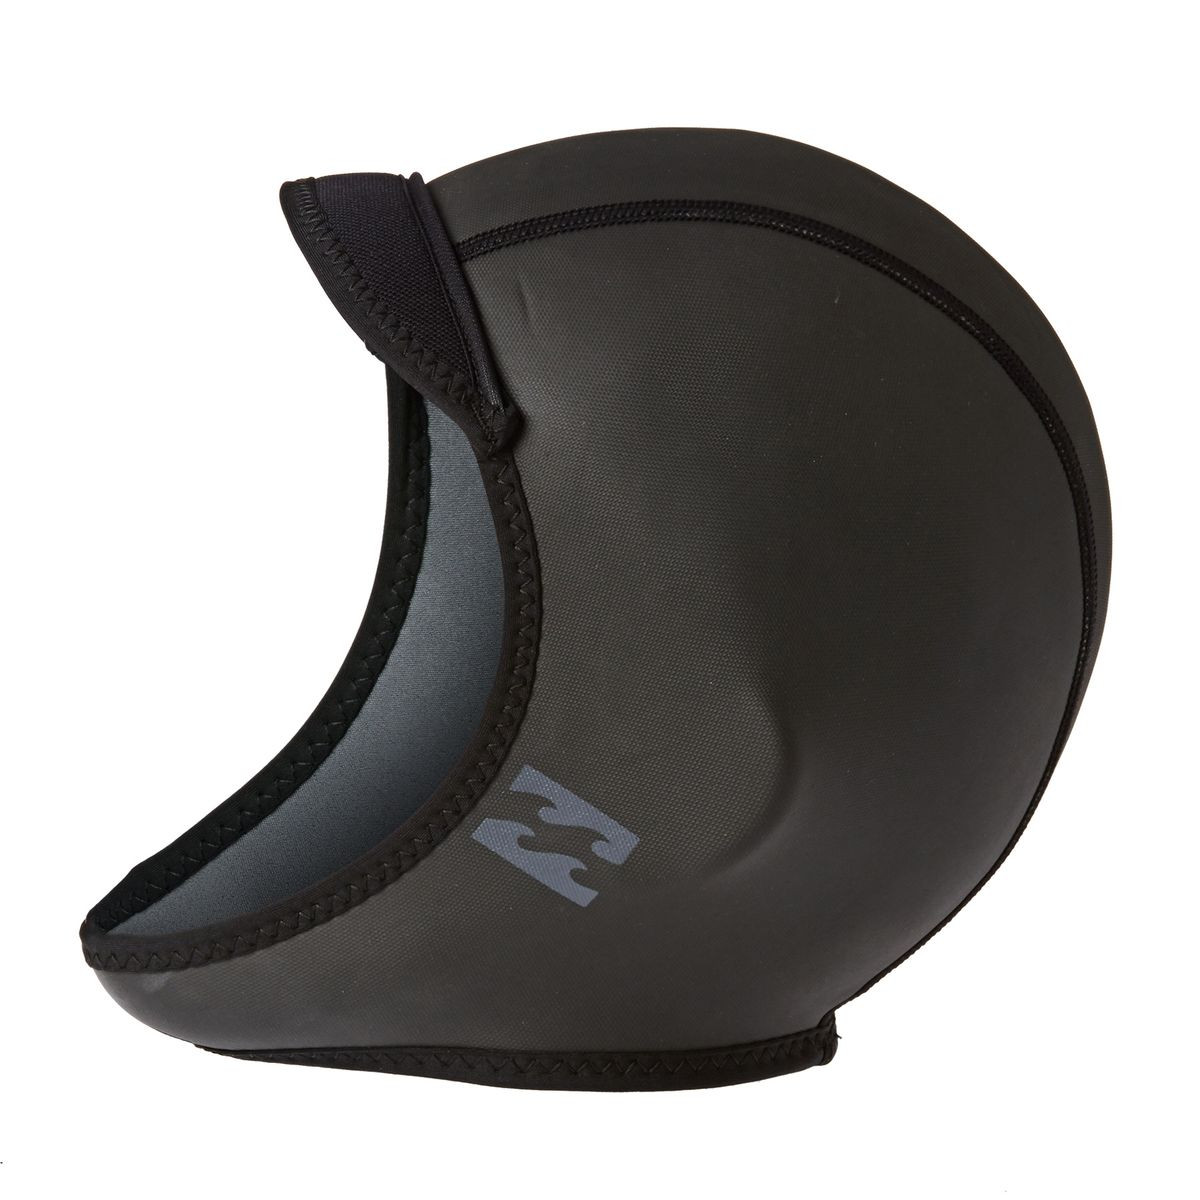 Billabong Xero Pro Wetsuit Hood - 2mm